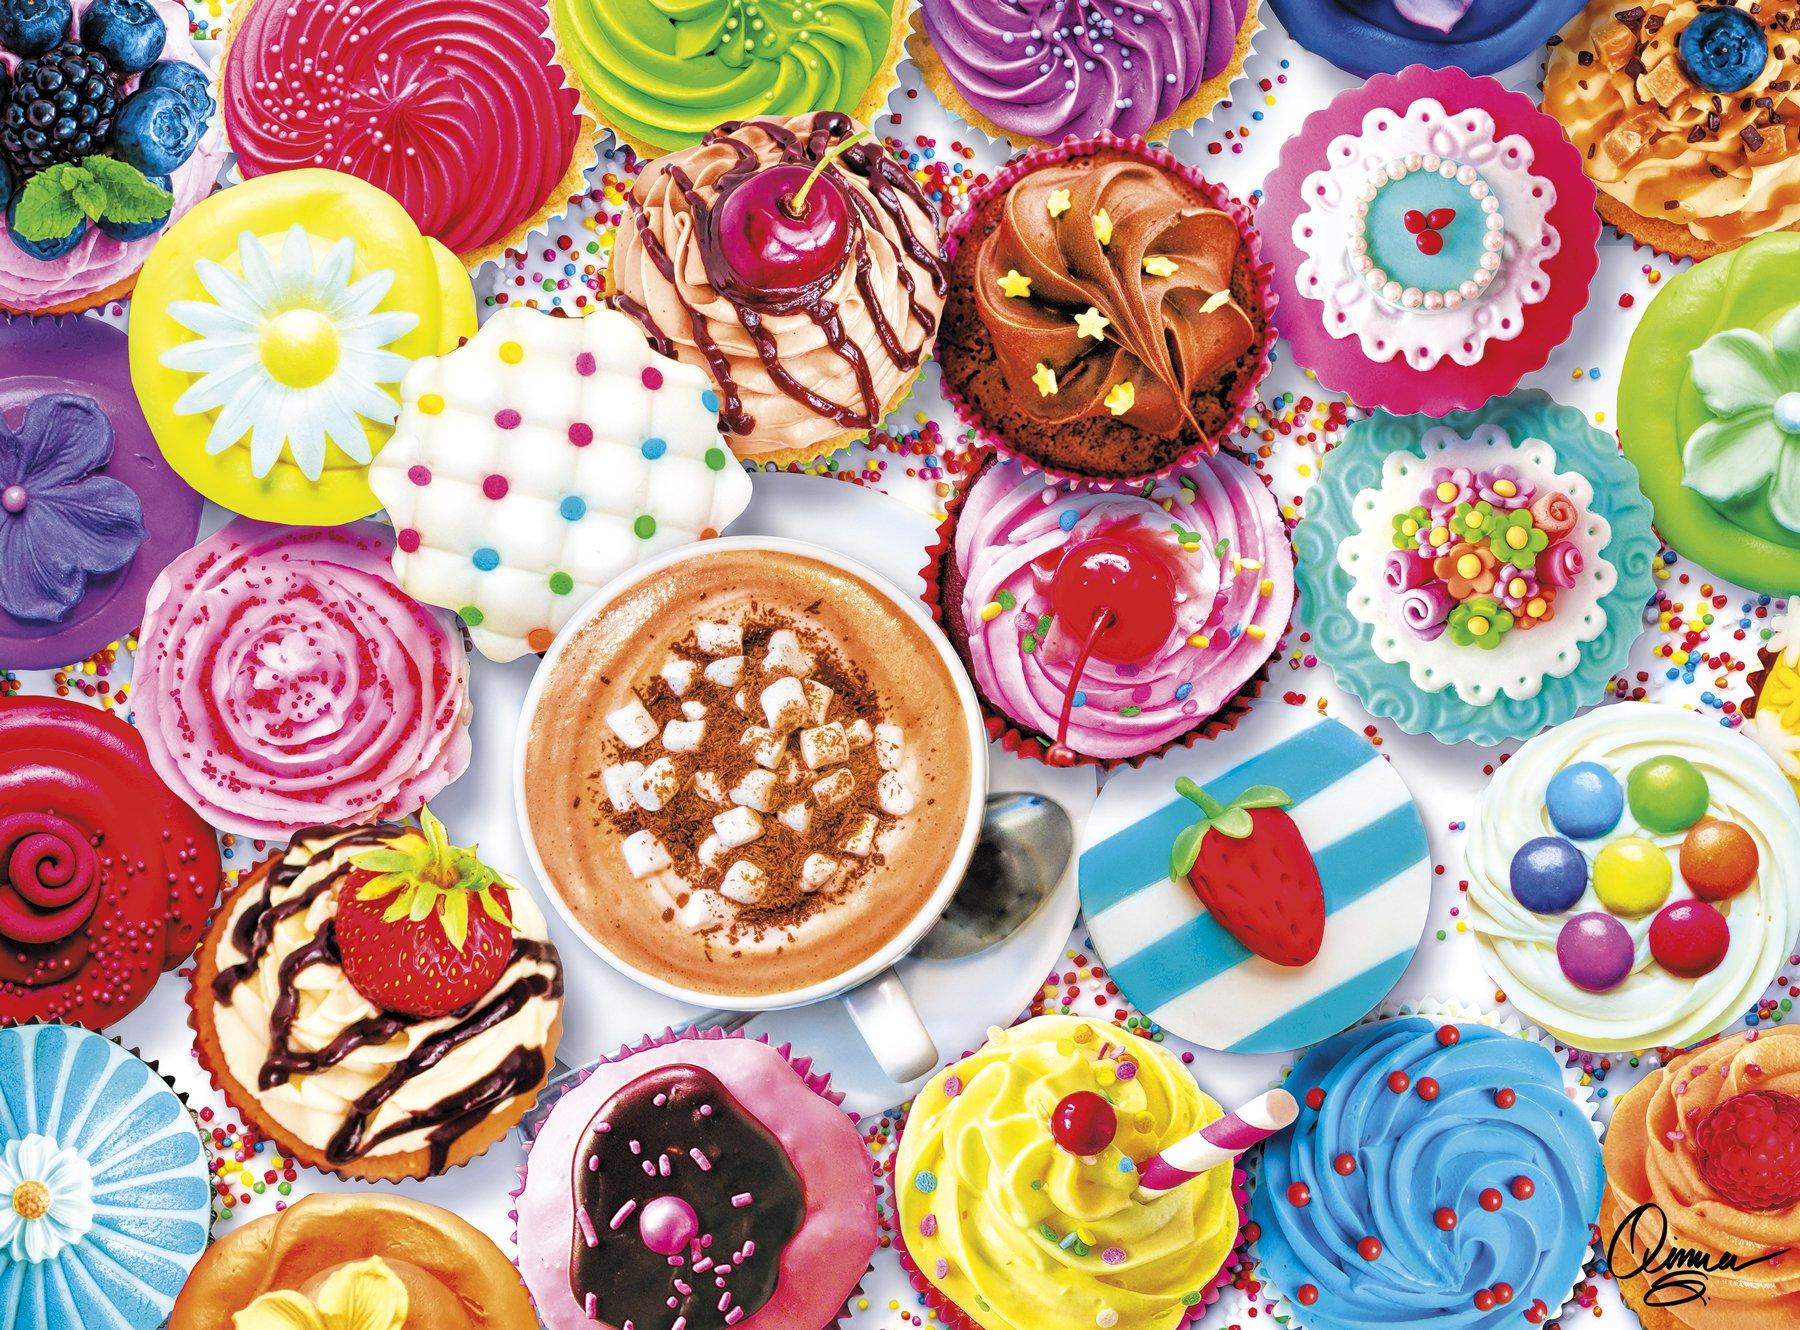 Buffalo Games - Vivid Collection - Aimee Stewart - Cupcakes & Cocoa - 1000 Piece Jigsaw Puzzle